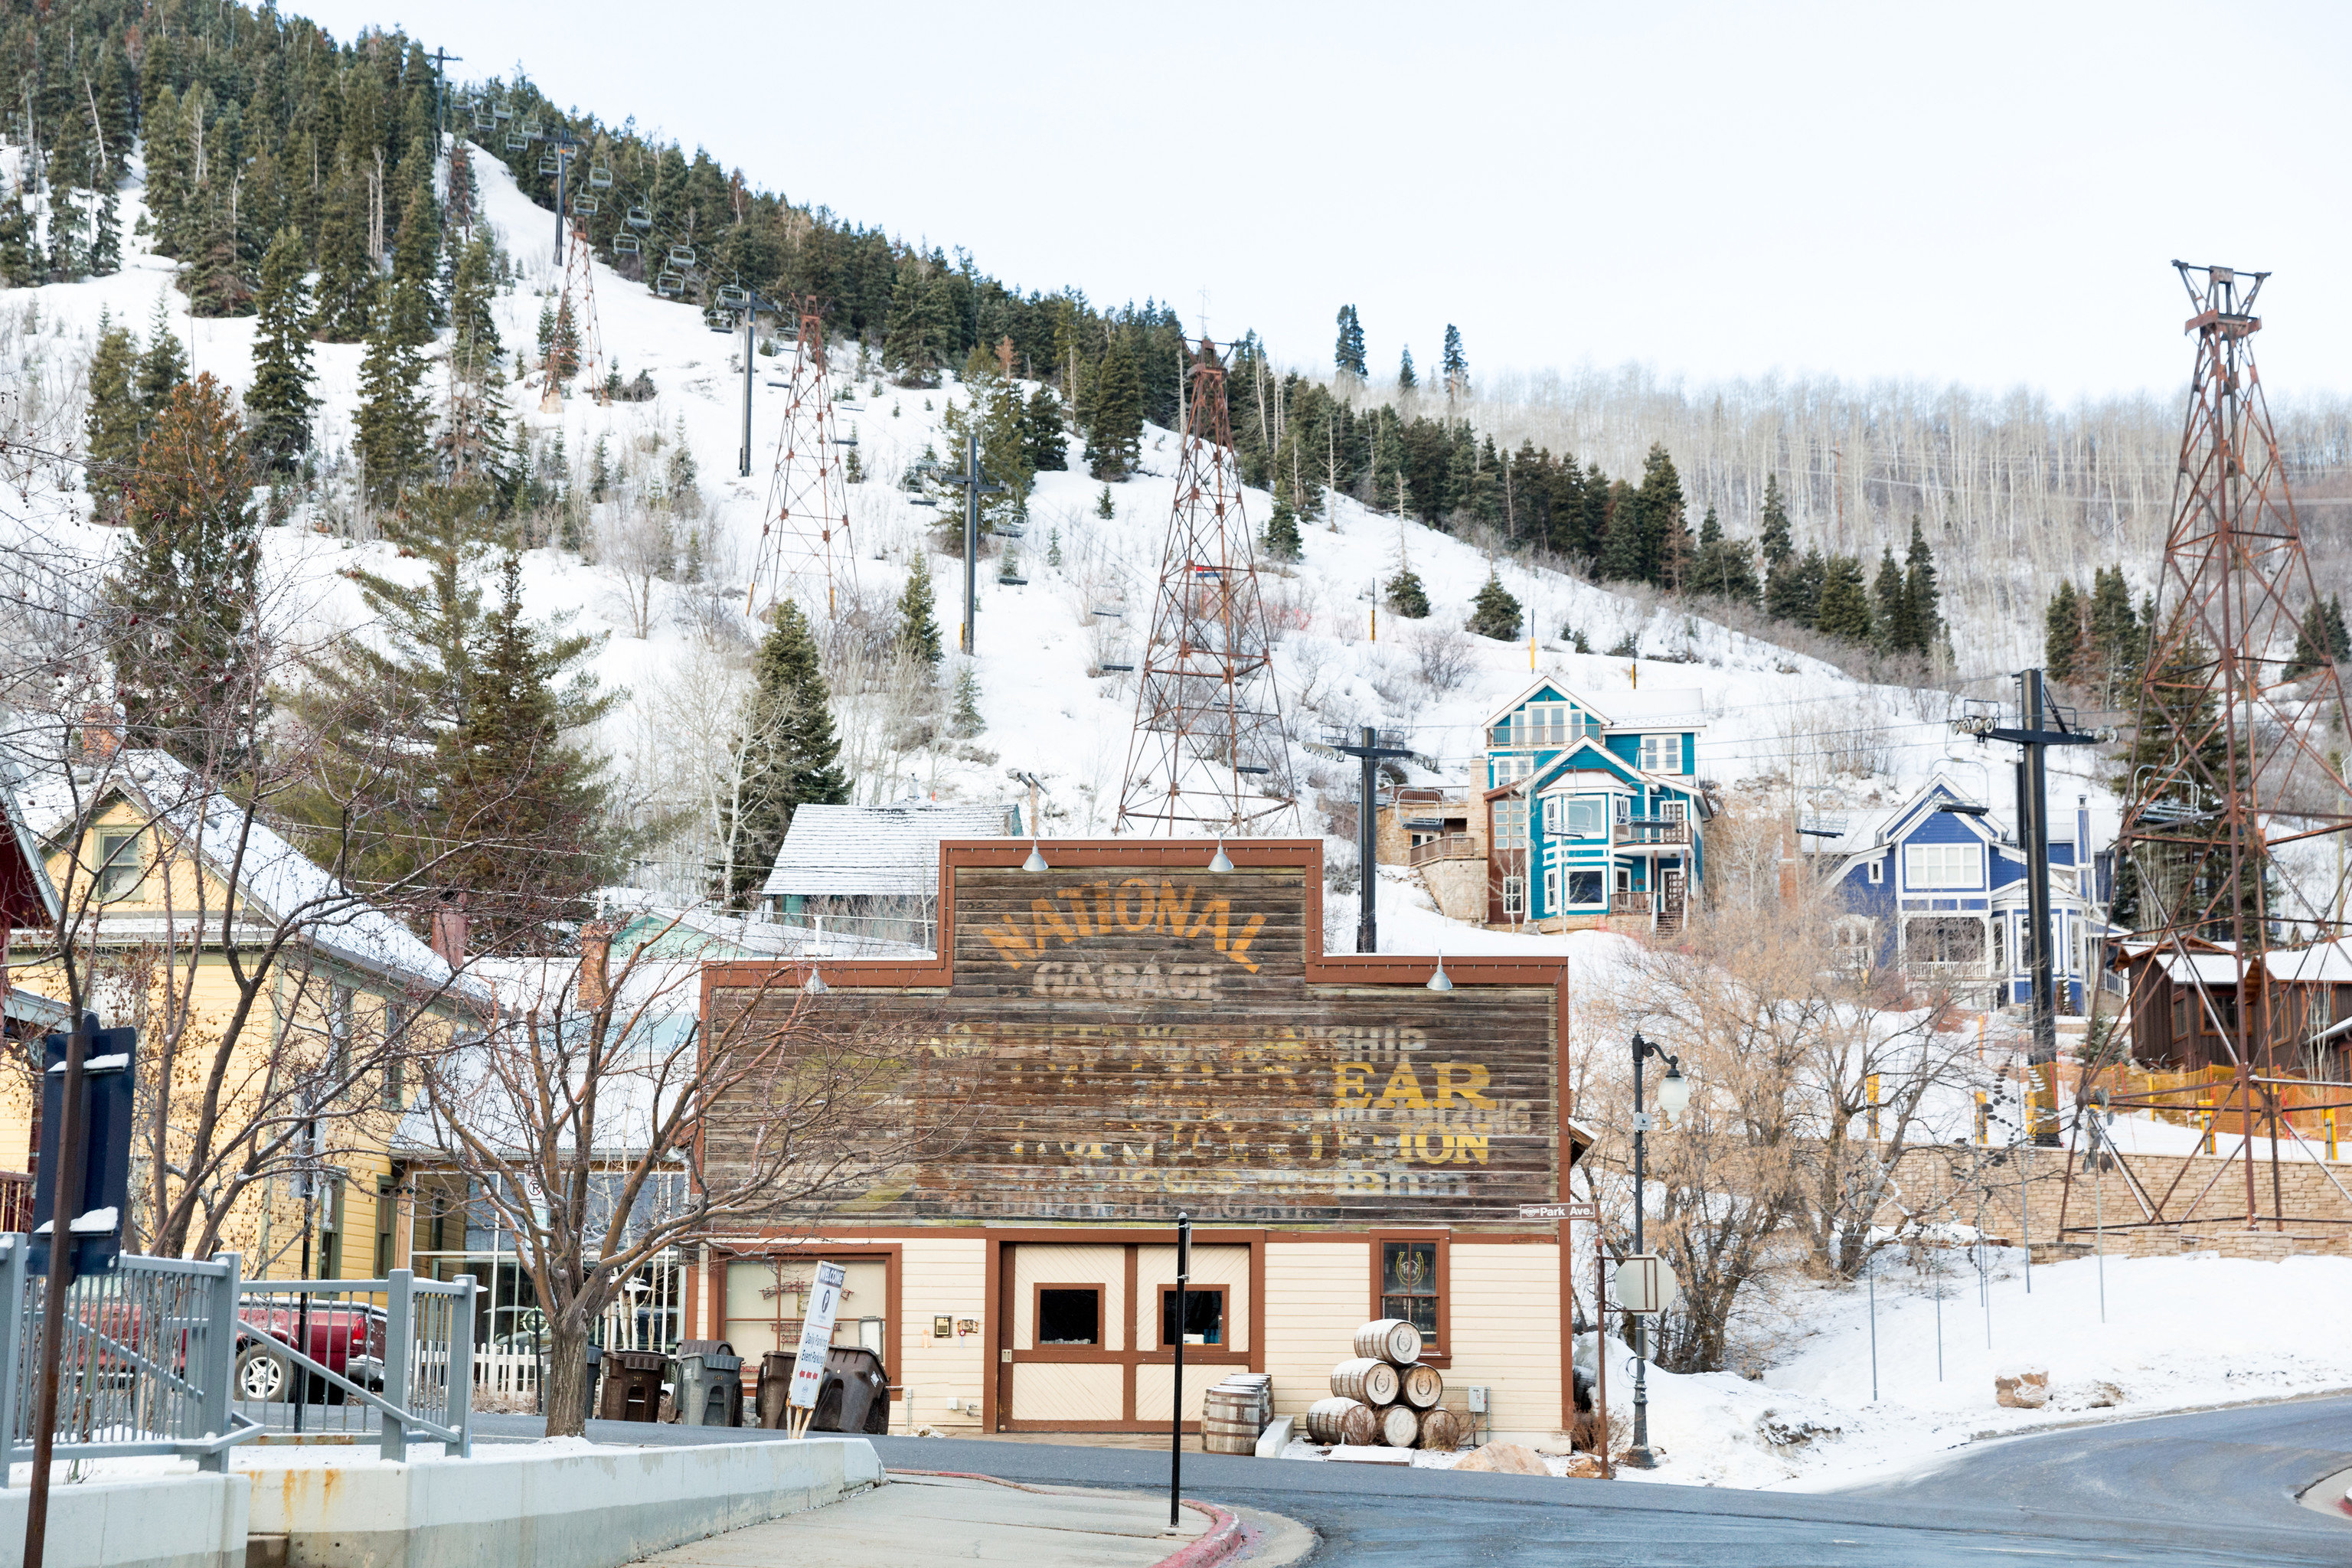 Trip Ideas Weekend Getaways outdoor snow tree Winter Town season Resort ski tow ski slope